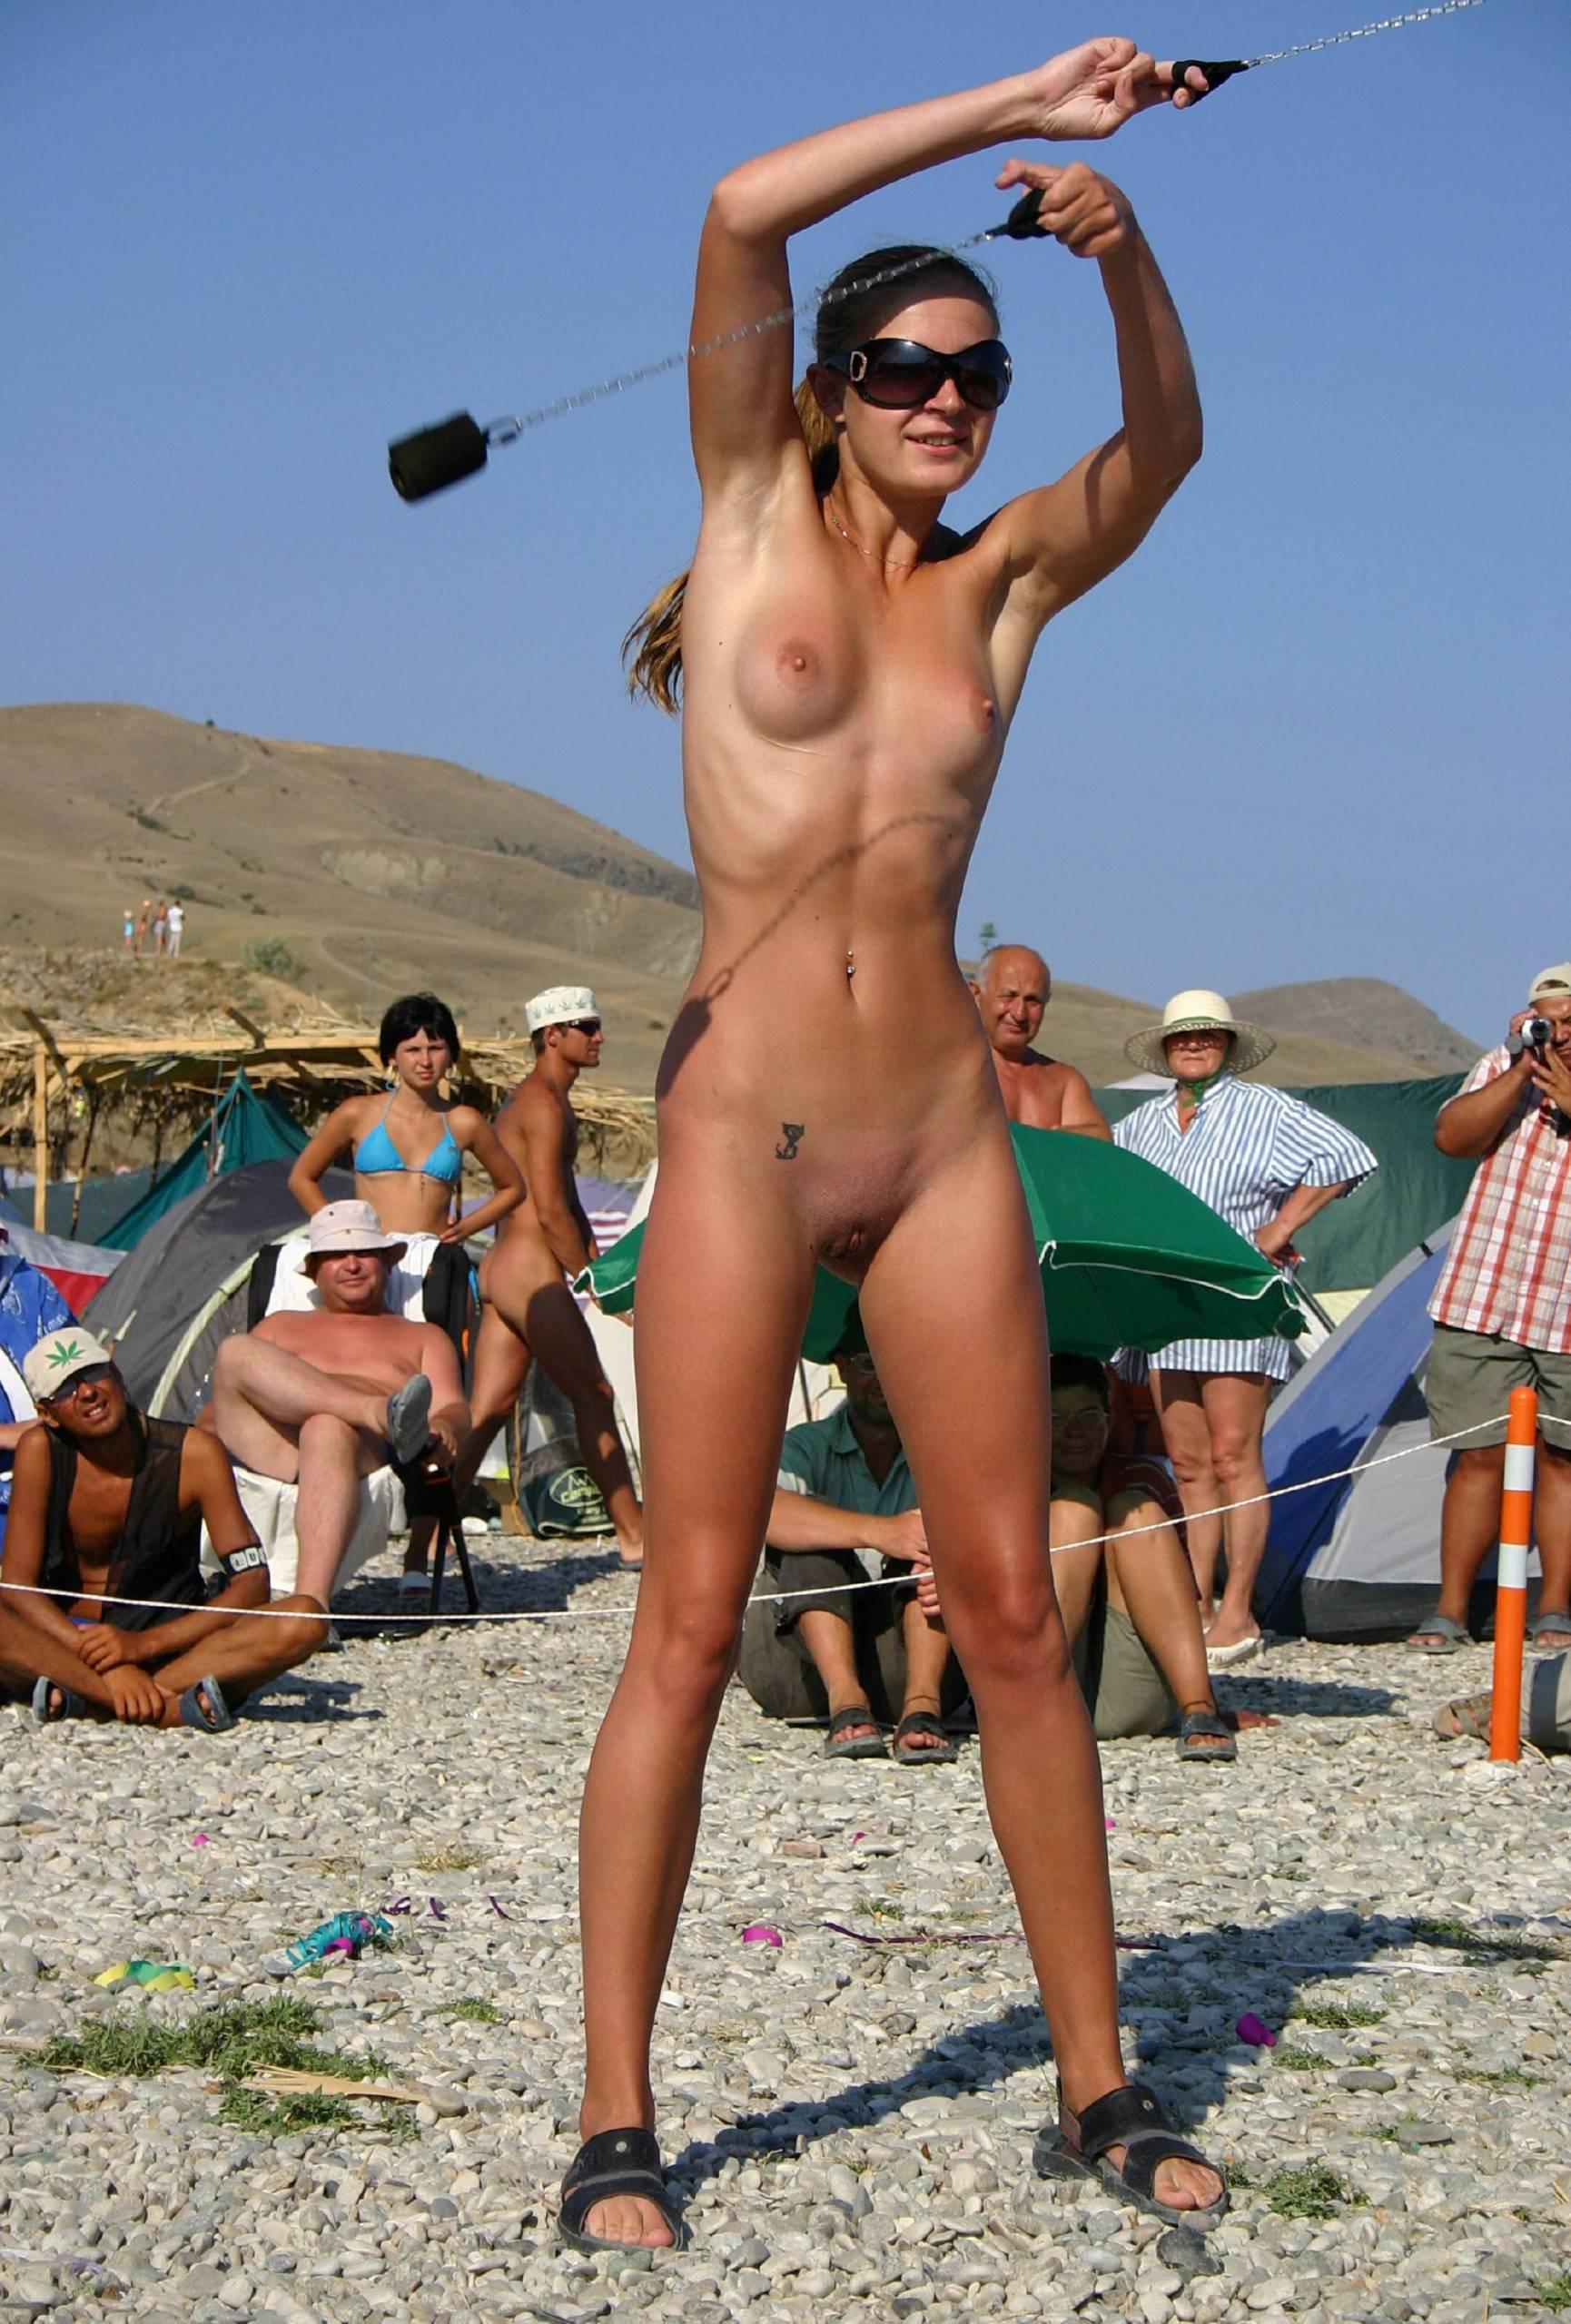 Pure Nudism Pics Female Fire Ninja Warrior - 1